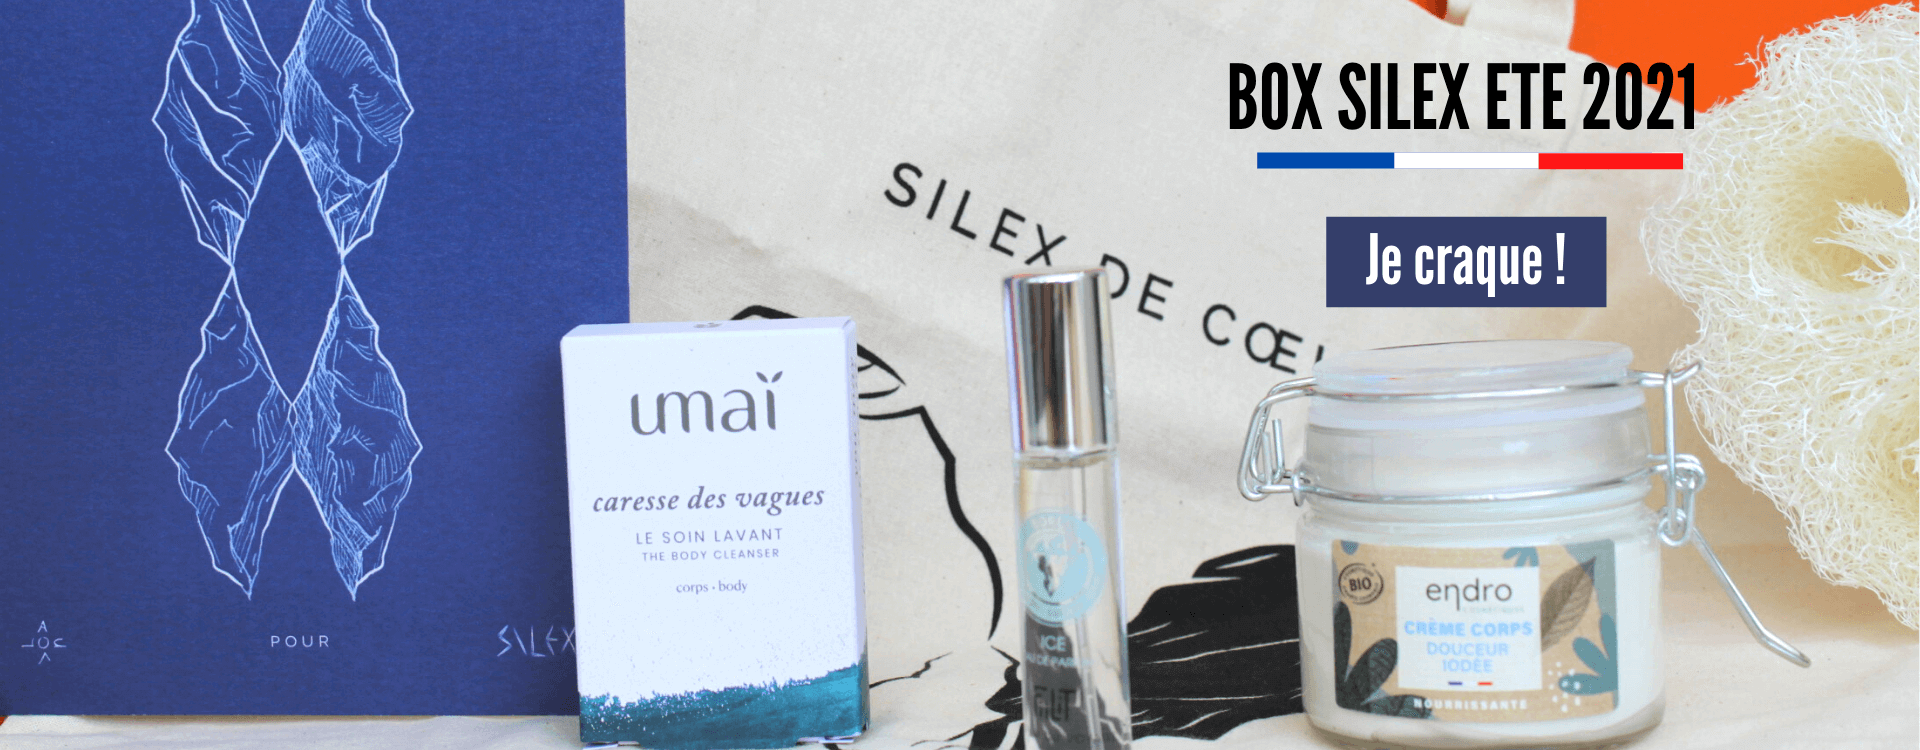 Box Silex Eté 2021